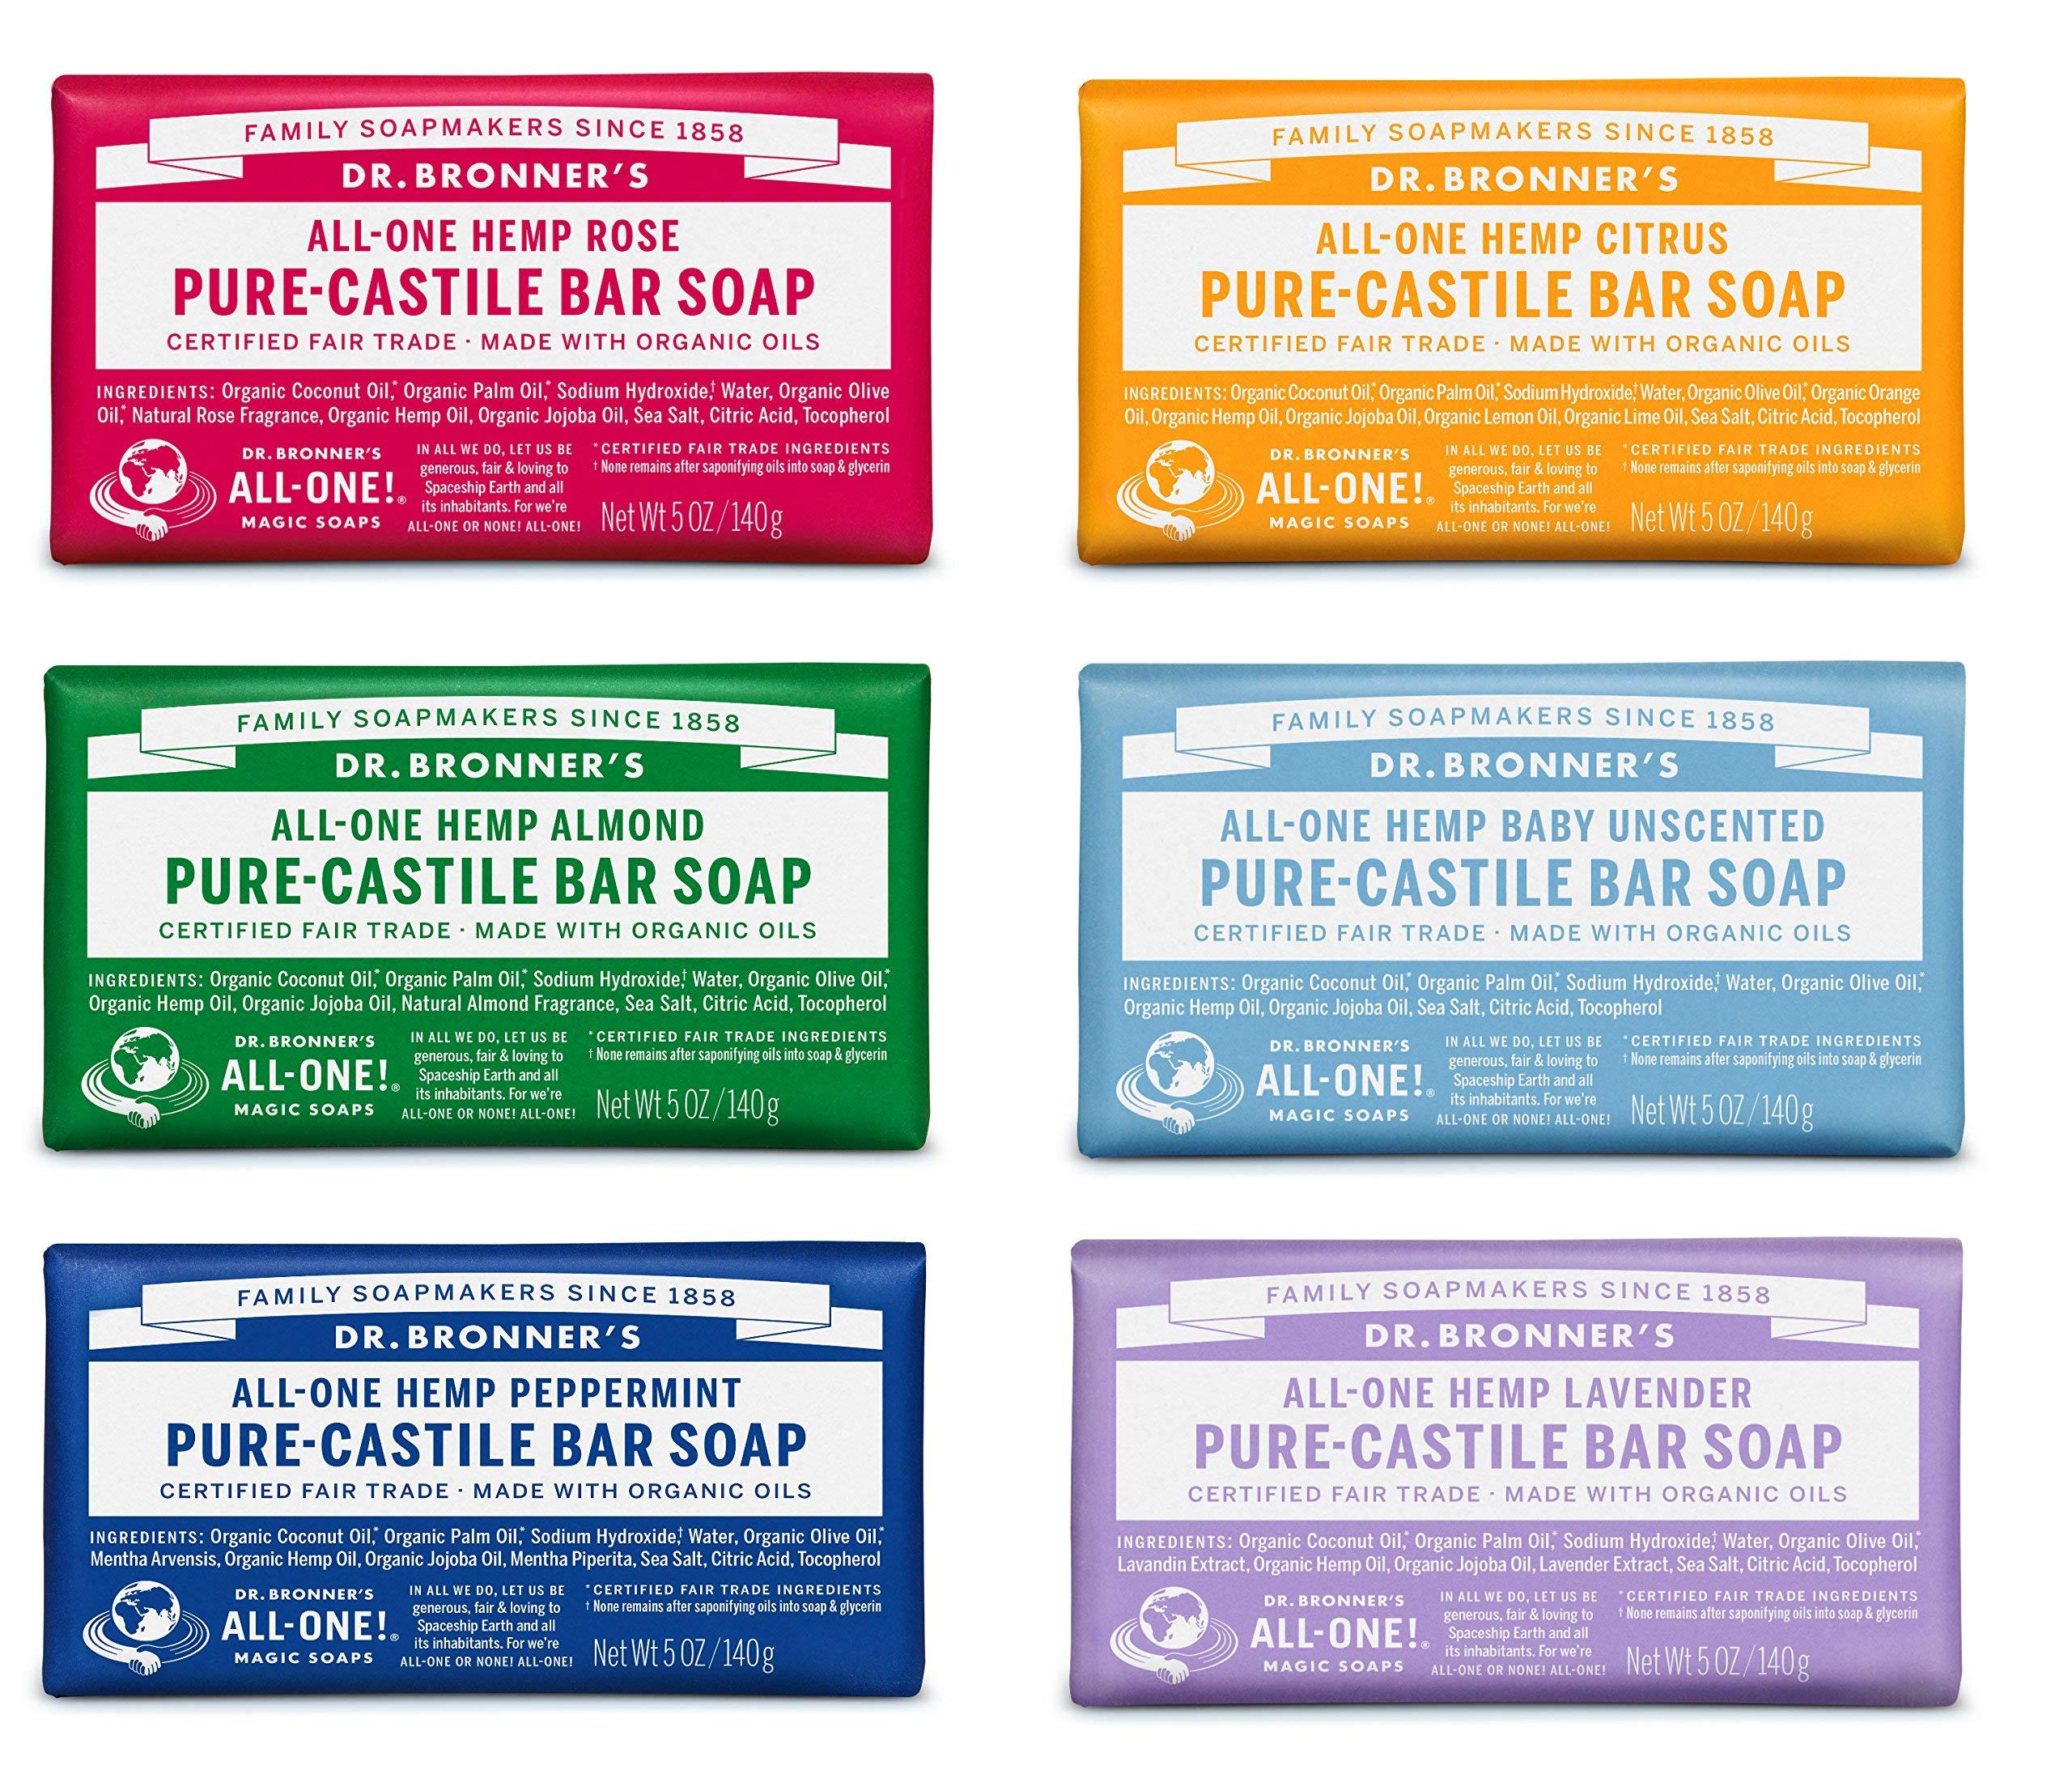 Dr. Bronner's Pure-Castile Bar Soap Variety Gift Pack- 5oz, 6 Pack by Dr. Bronner's